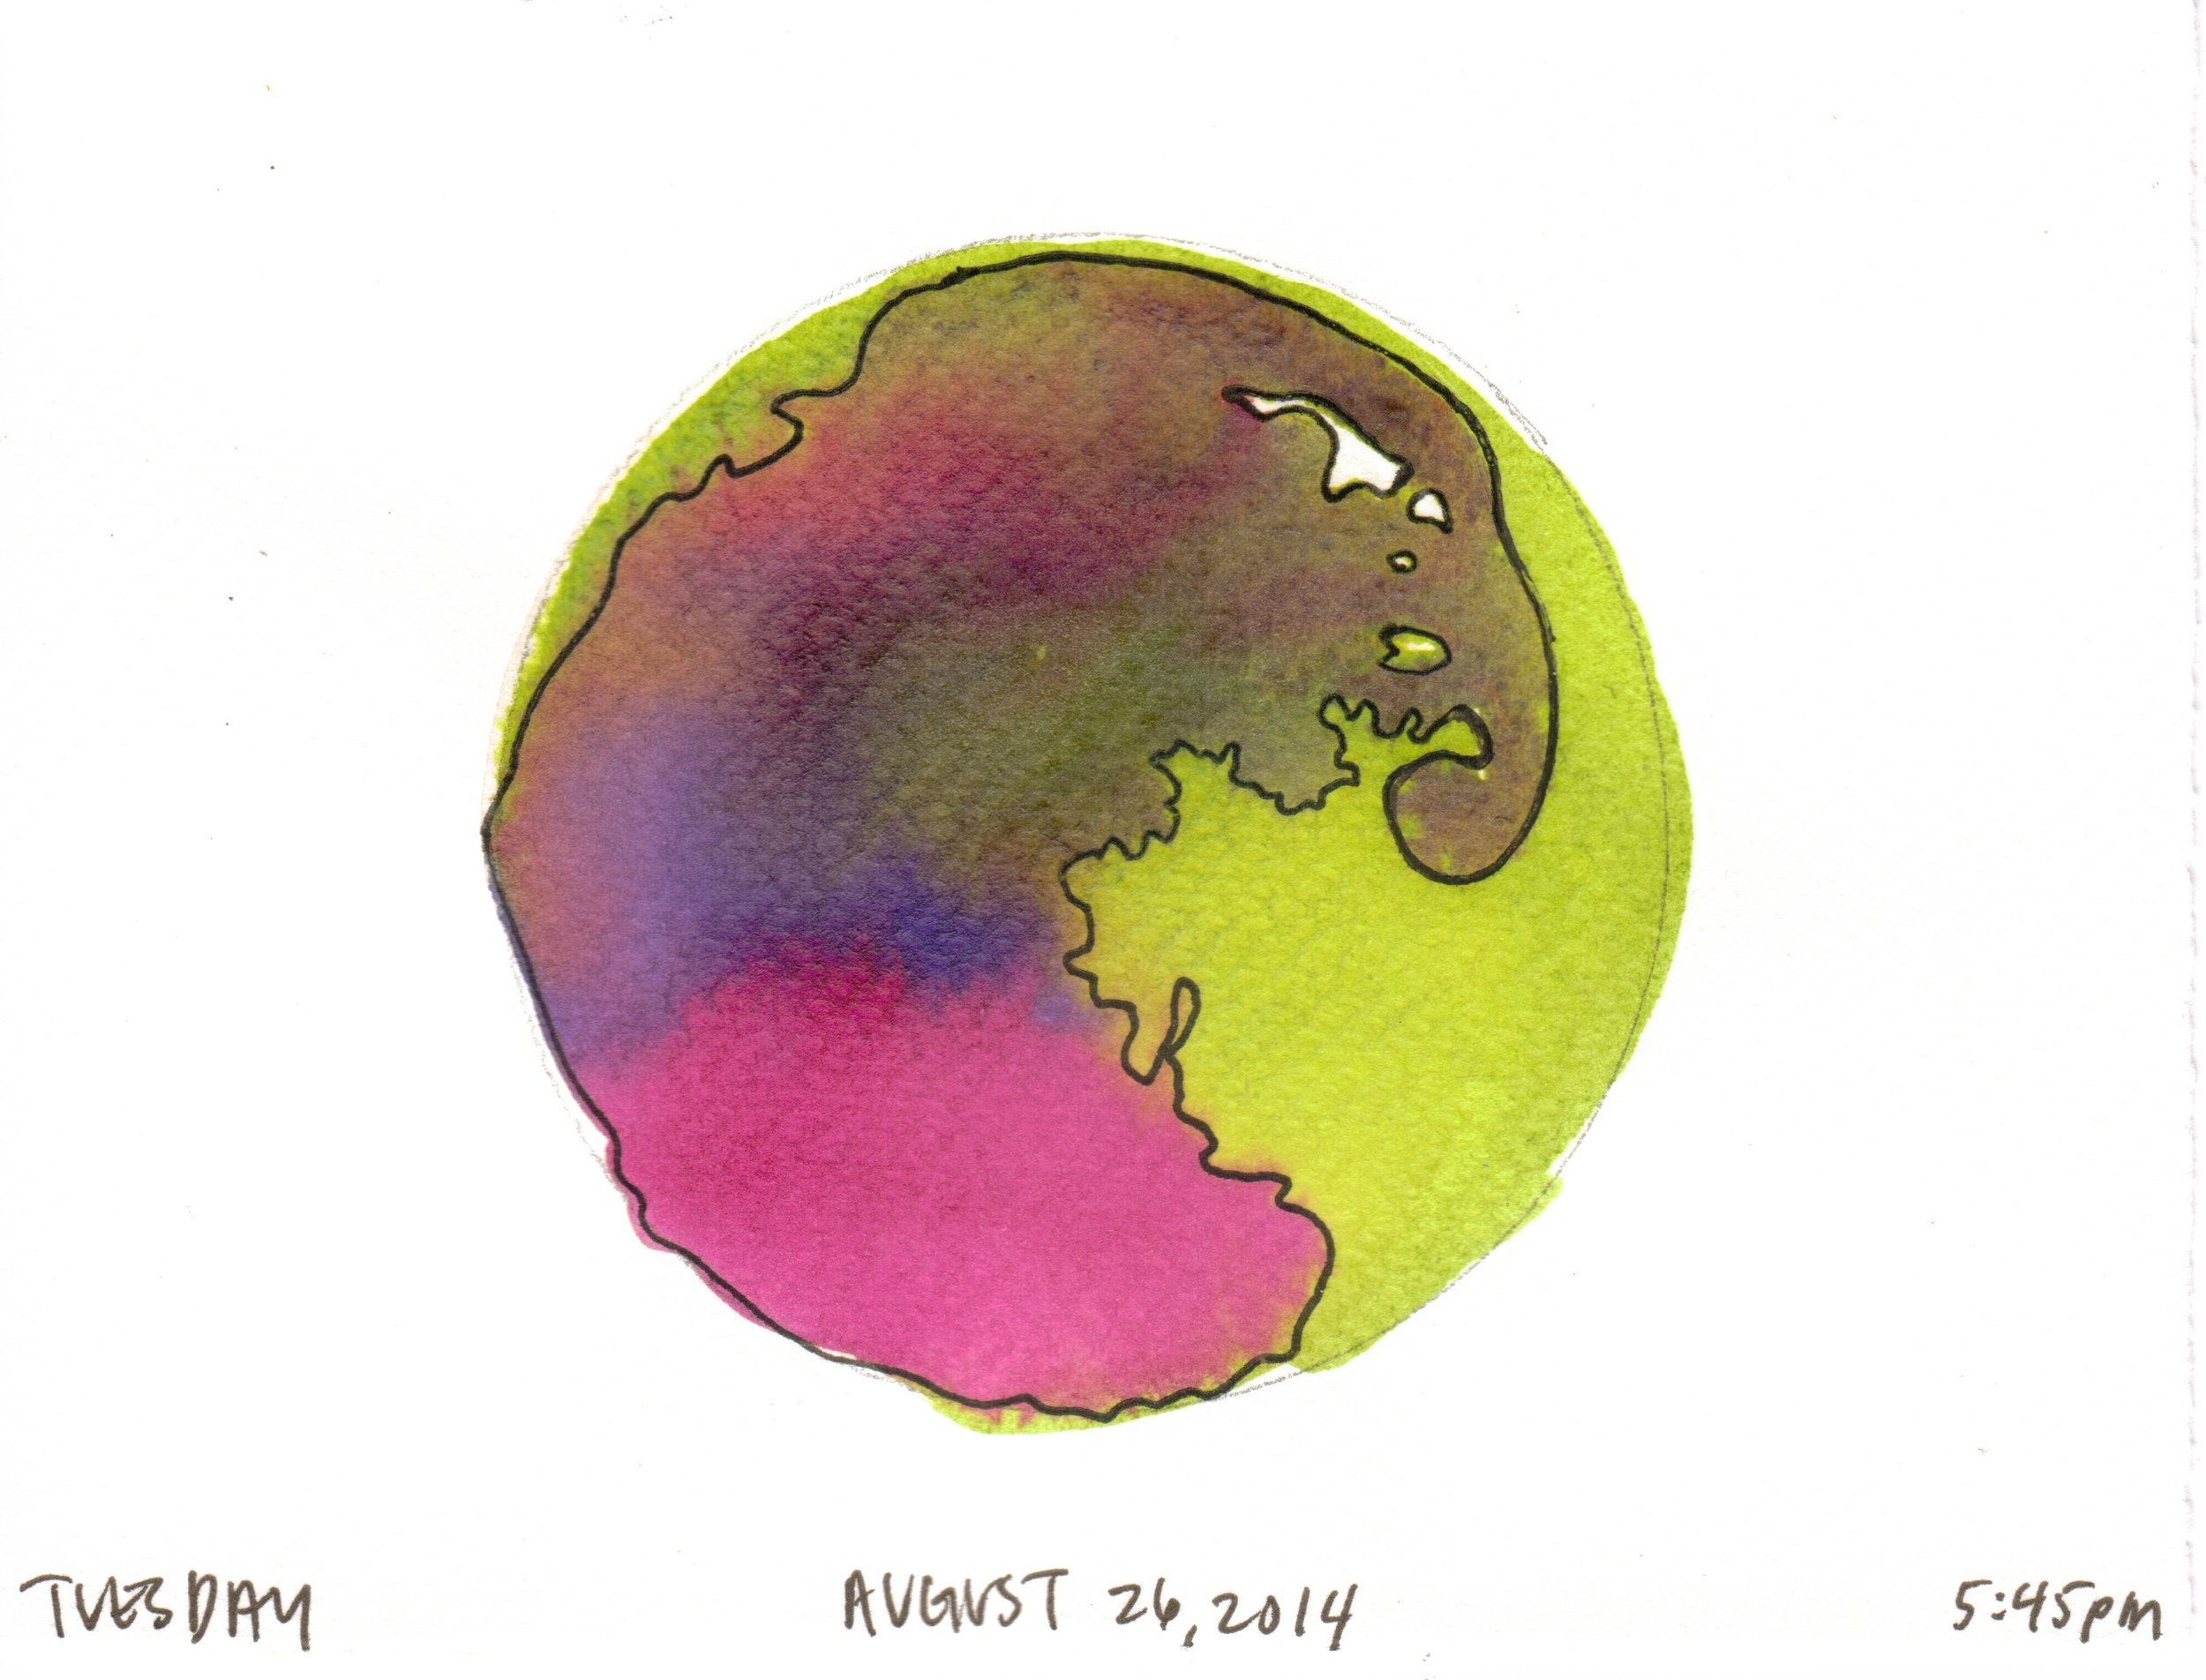 08.26.14